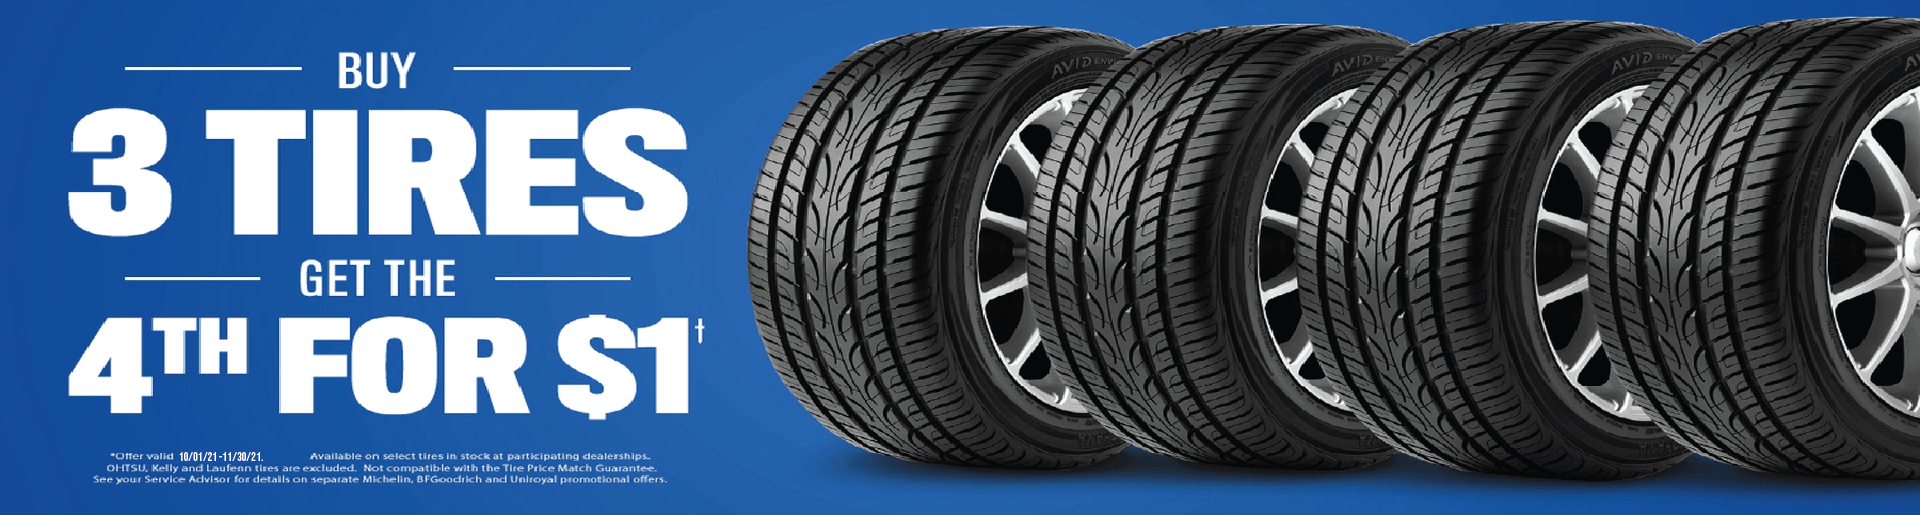 oct tires 2